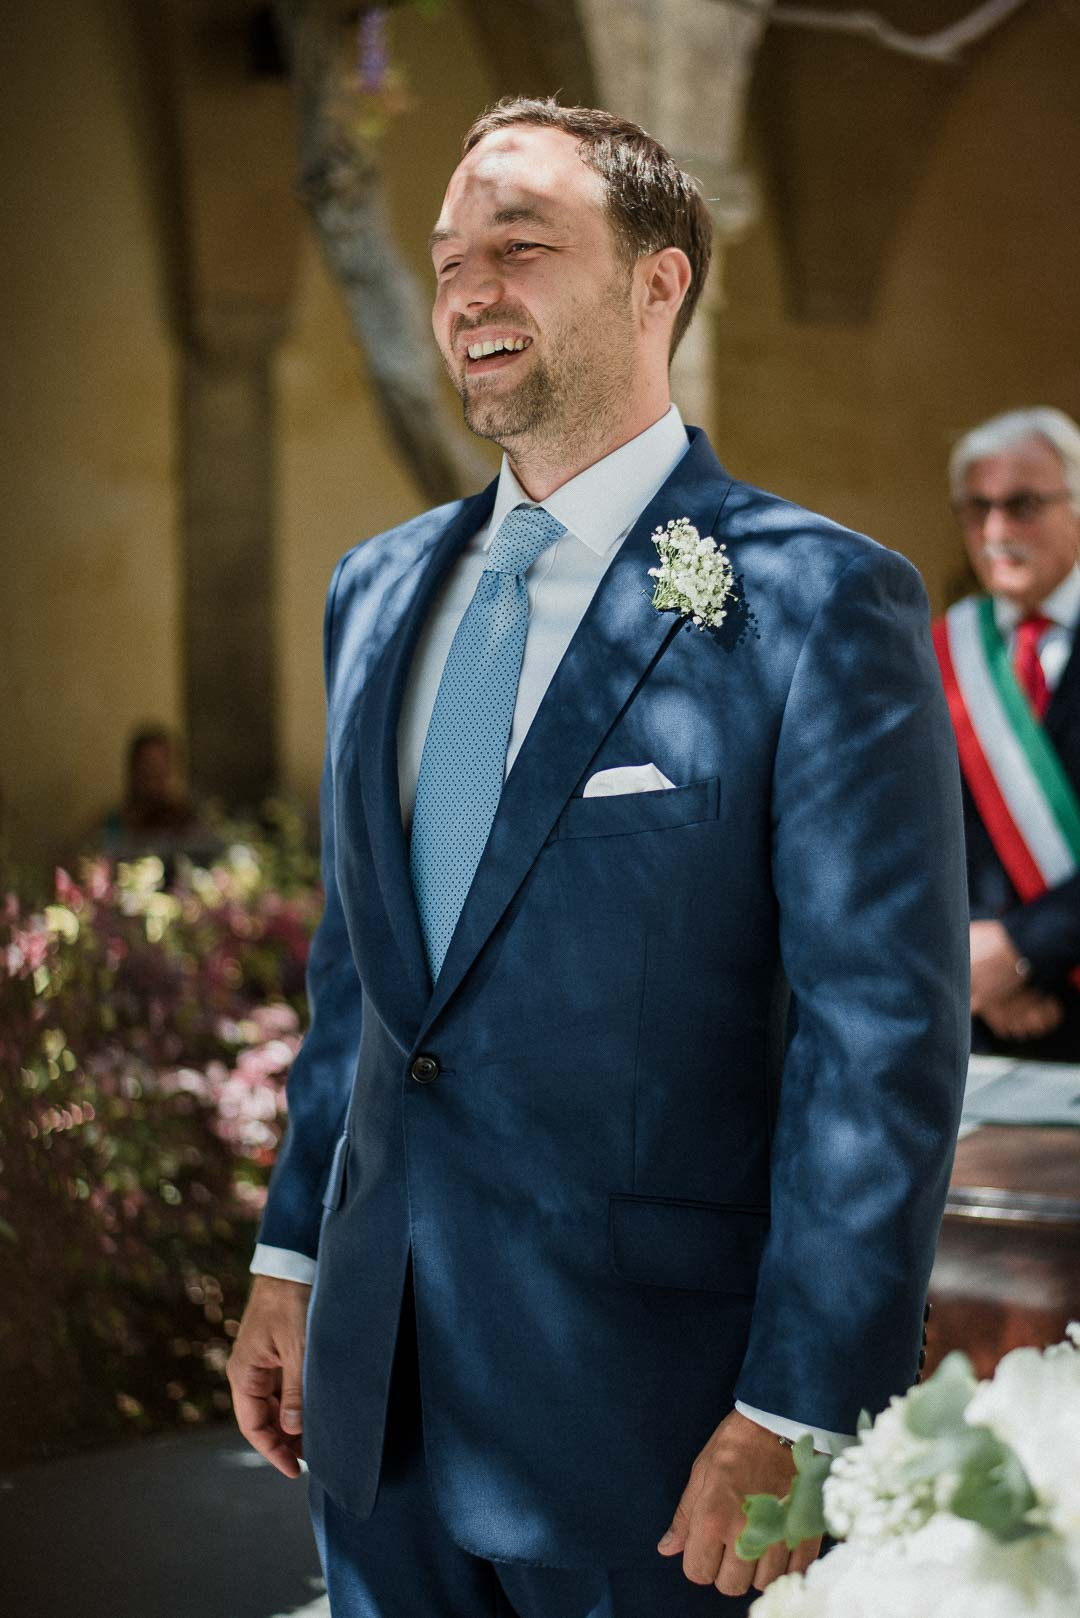 wedding-photographer-destination-fineart-bespoke-reportage-sorrento-parcodeiprincipi-vivianeizzo-spazio46-37